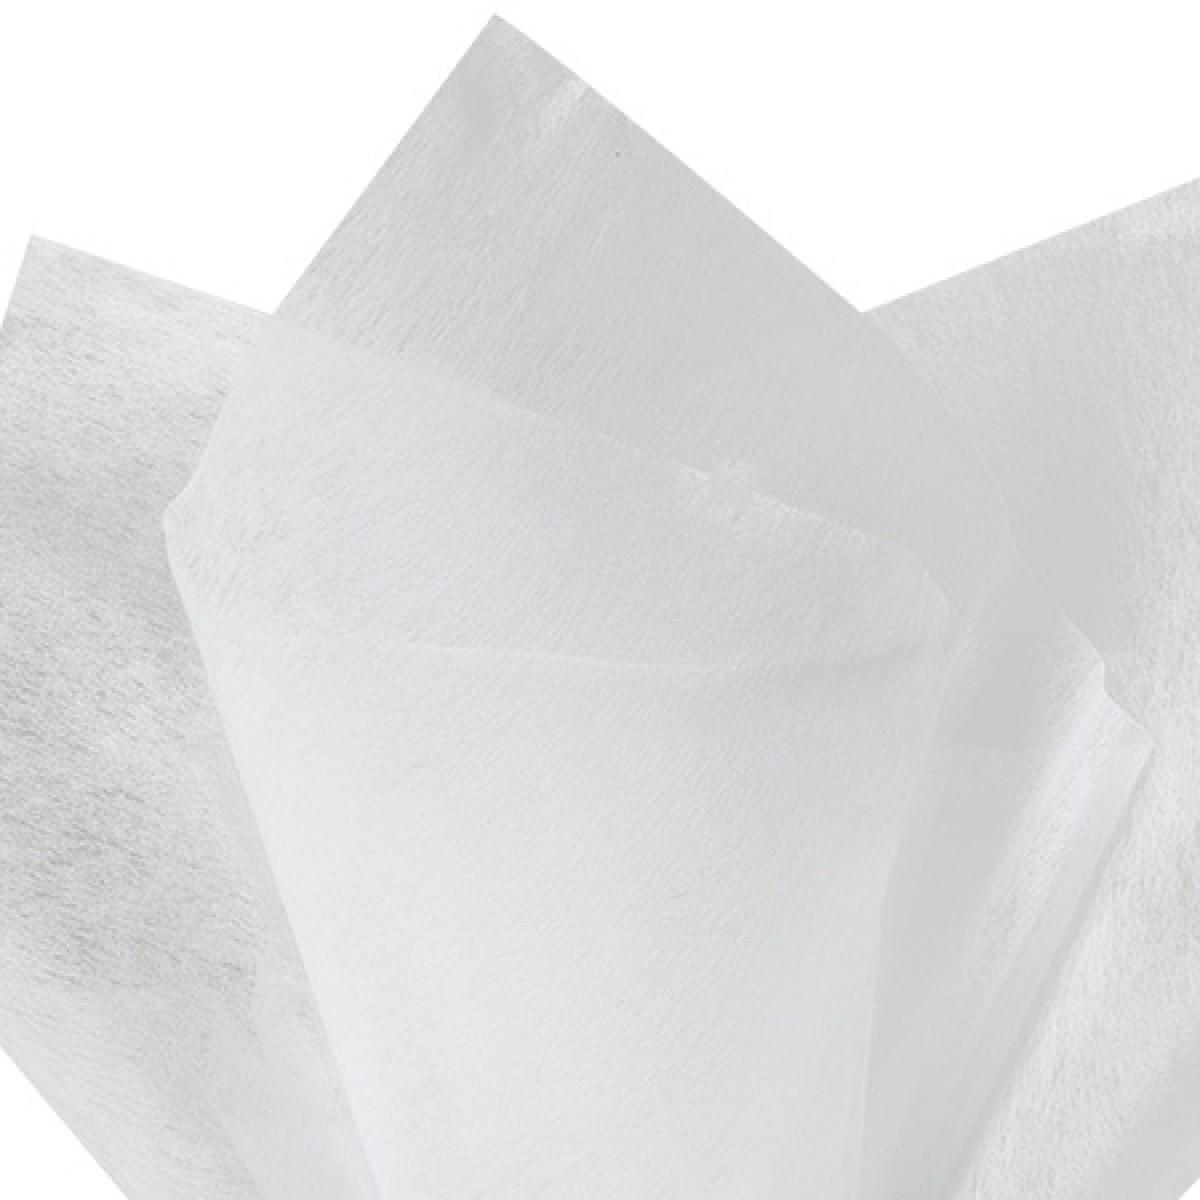 7524 Neon Green 75cmx60cm Tissue Floral Wraps - 100 Sheets